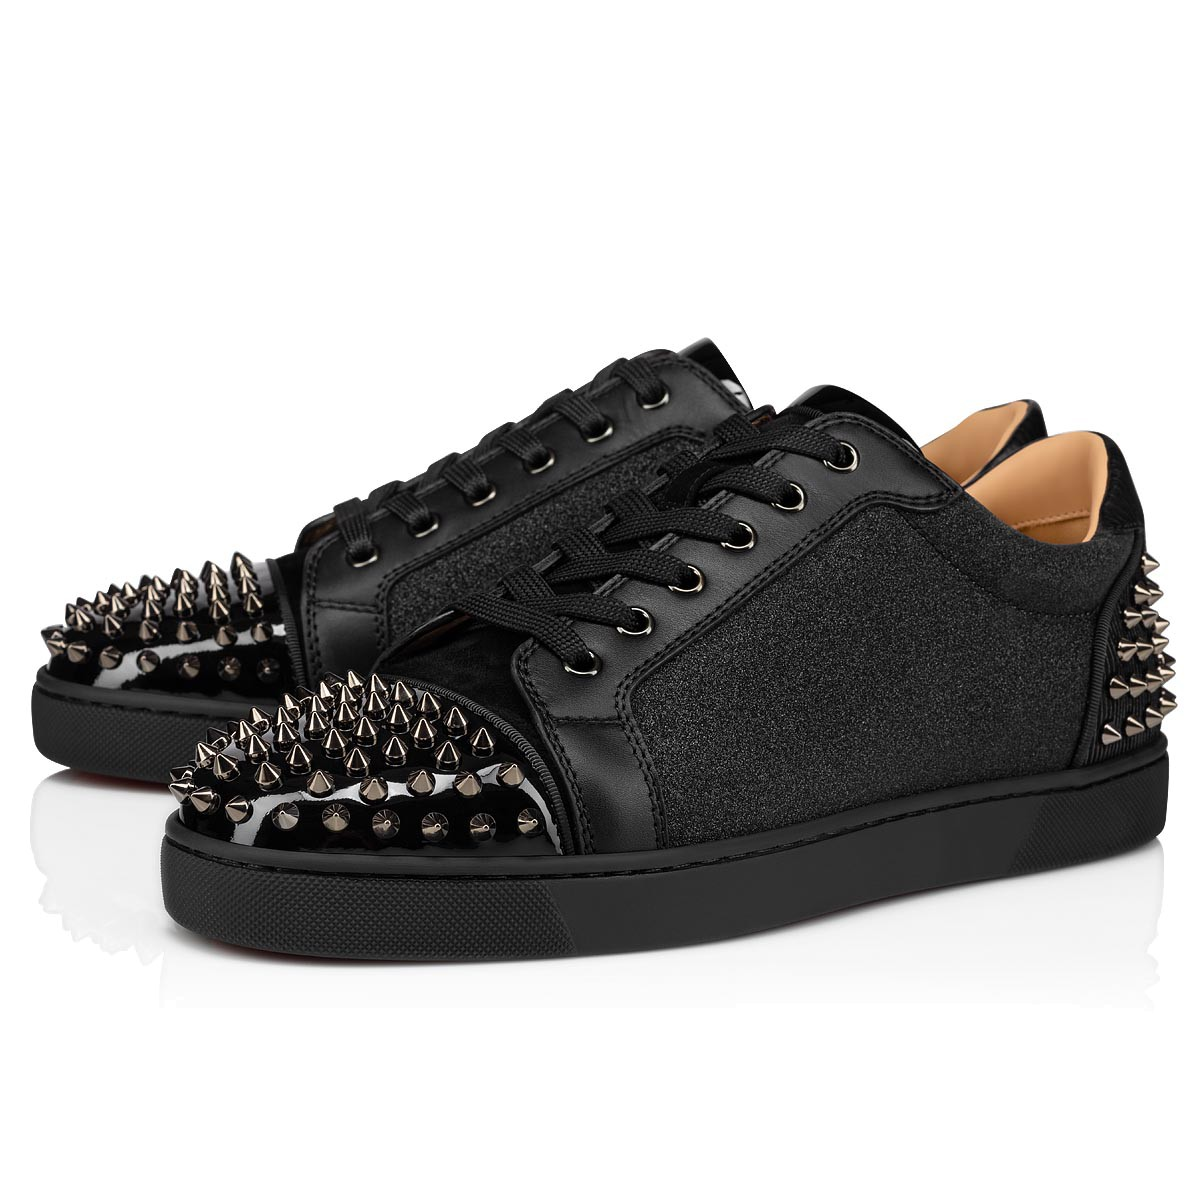 Shoes - Seavaste 2 - Christian Louboutin